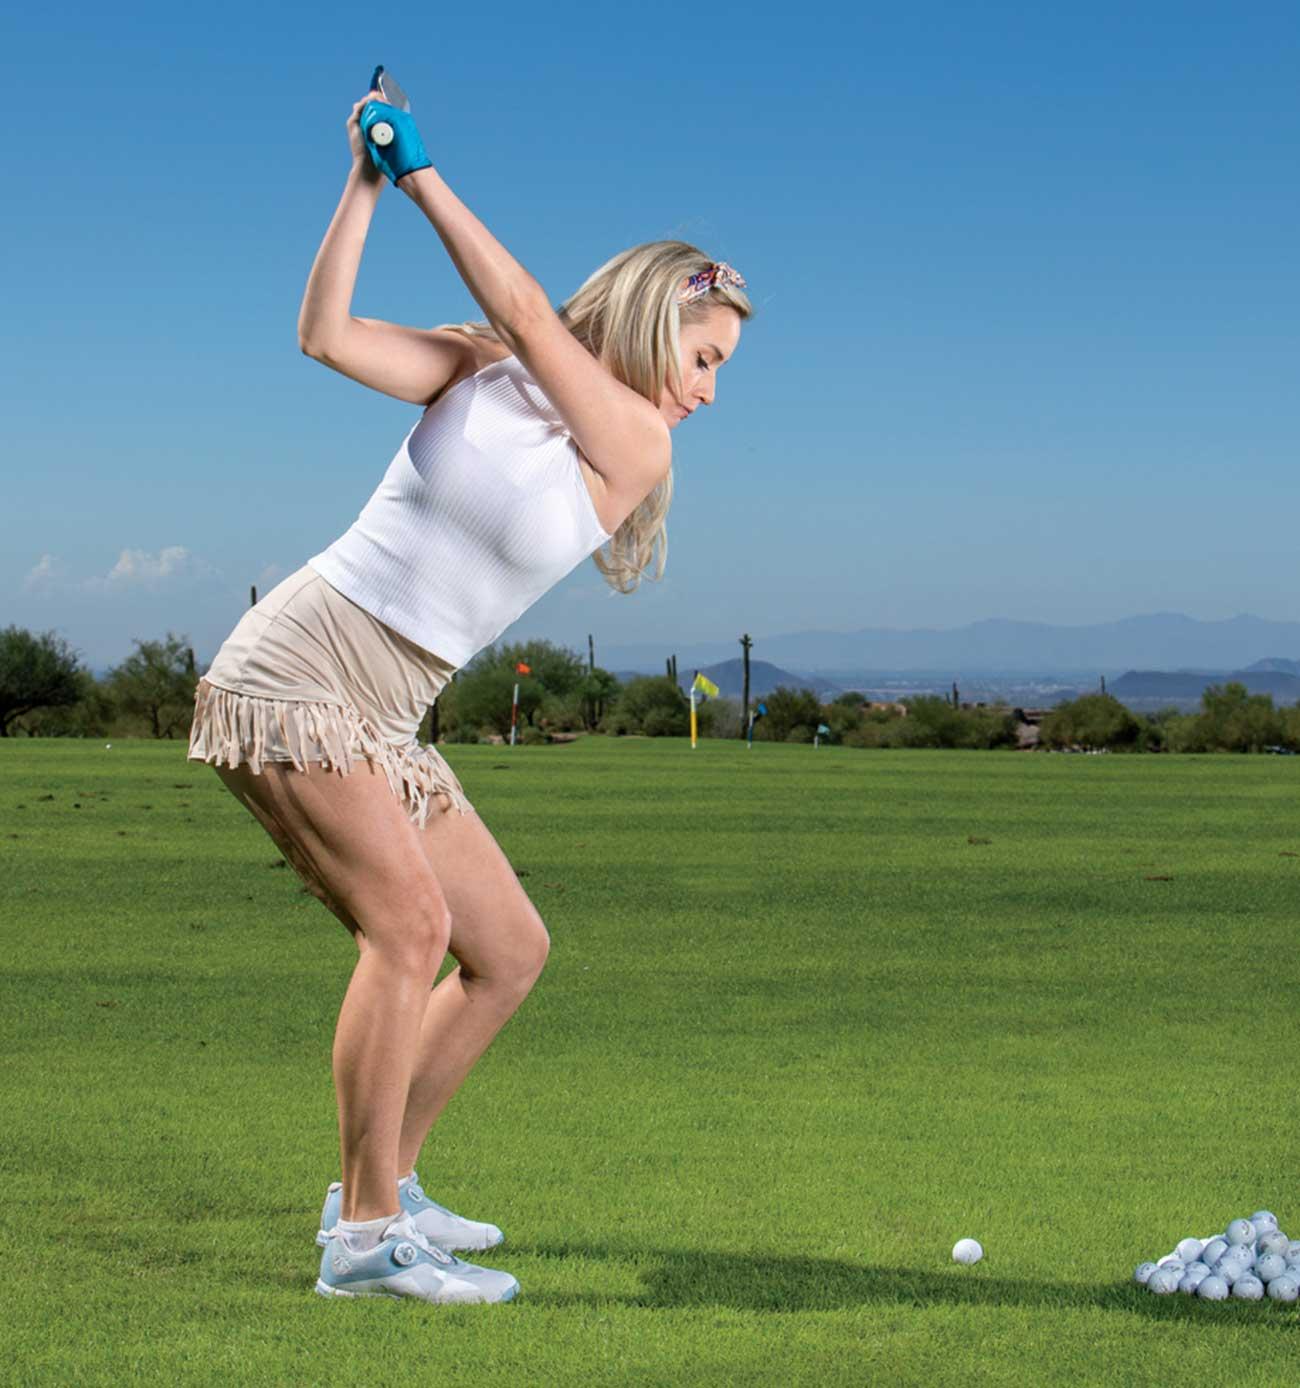 Paige Spiranac takes aim on the range.